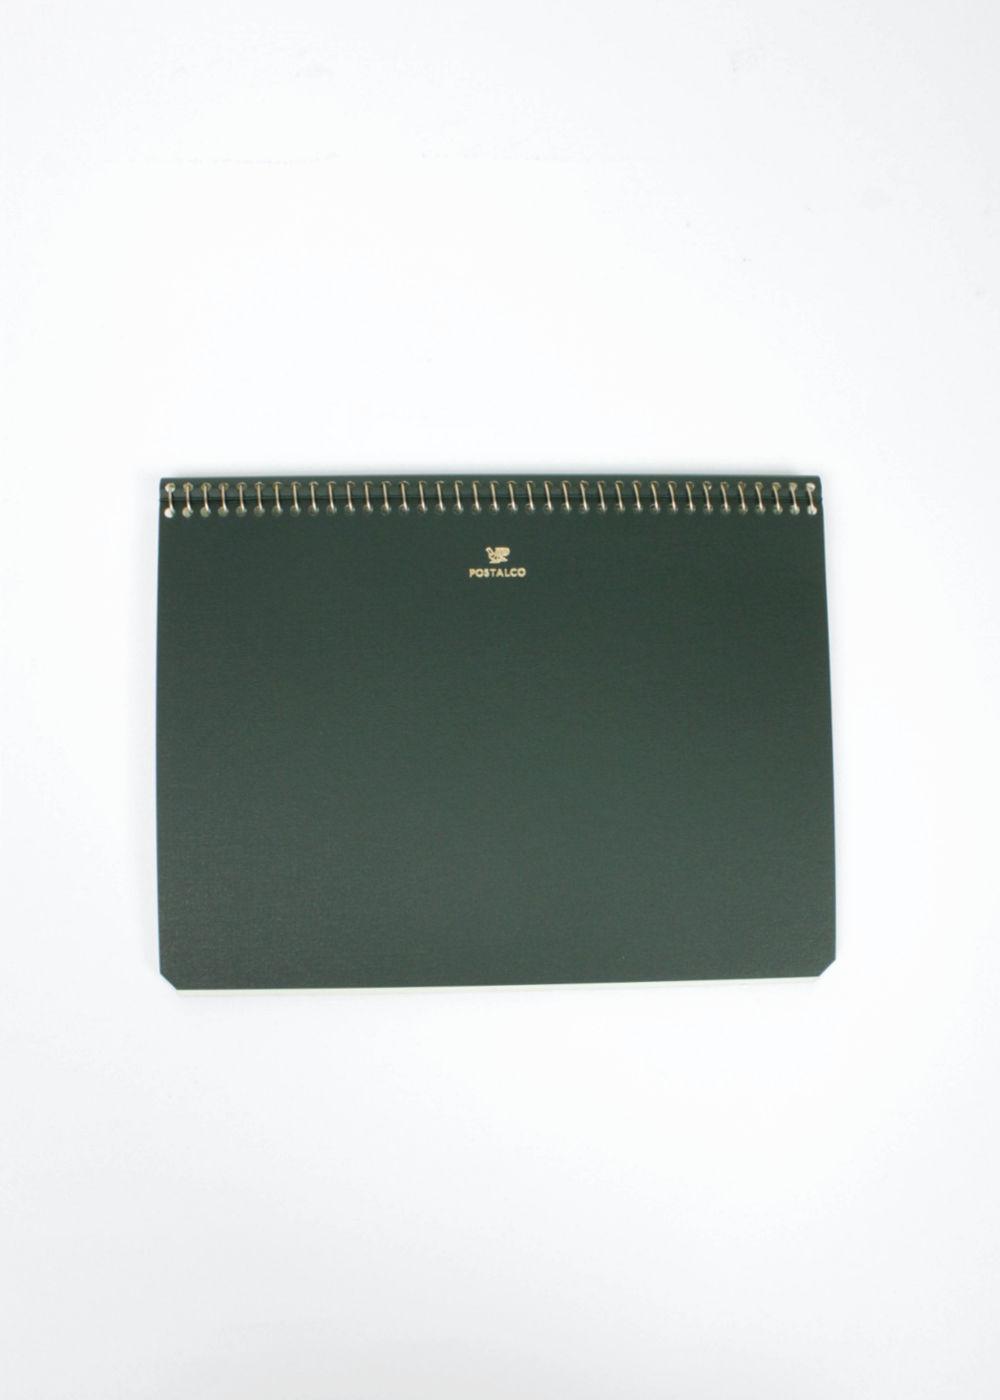 Postalco-Notebook-A5-Bankgreen-01